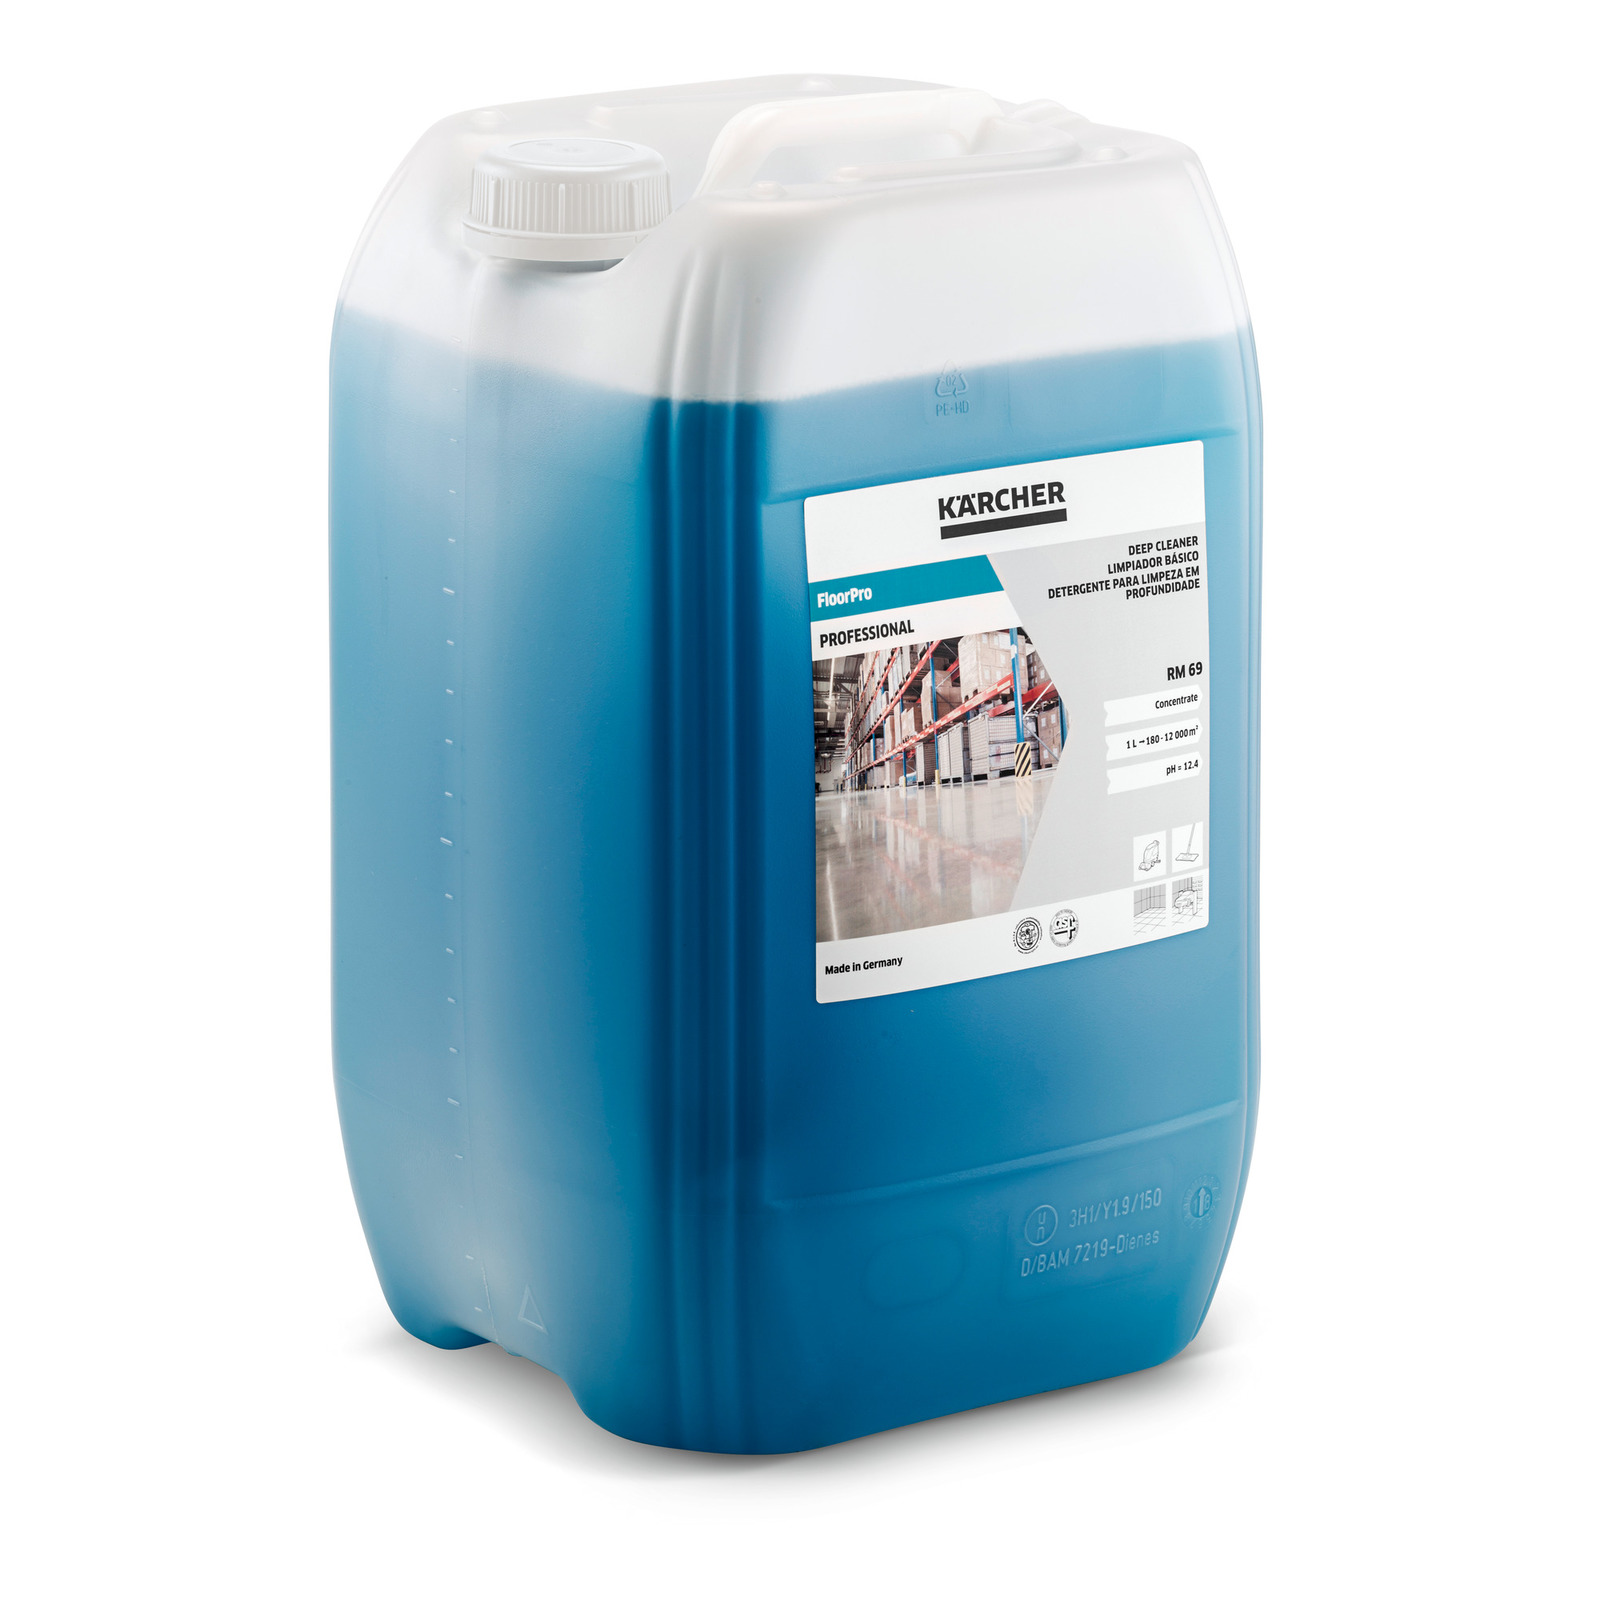 FloorPro Deep Cleaner RM 69, 20 L